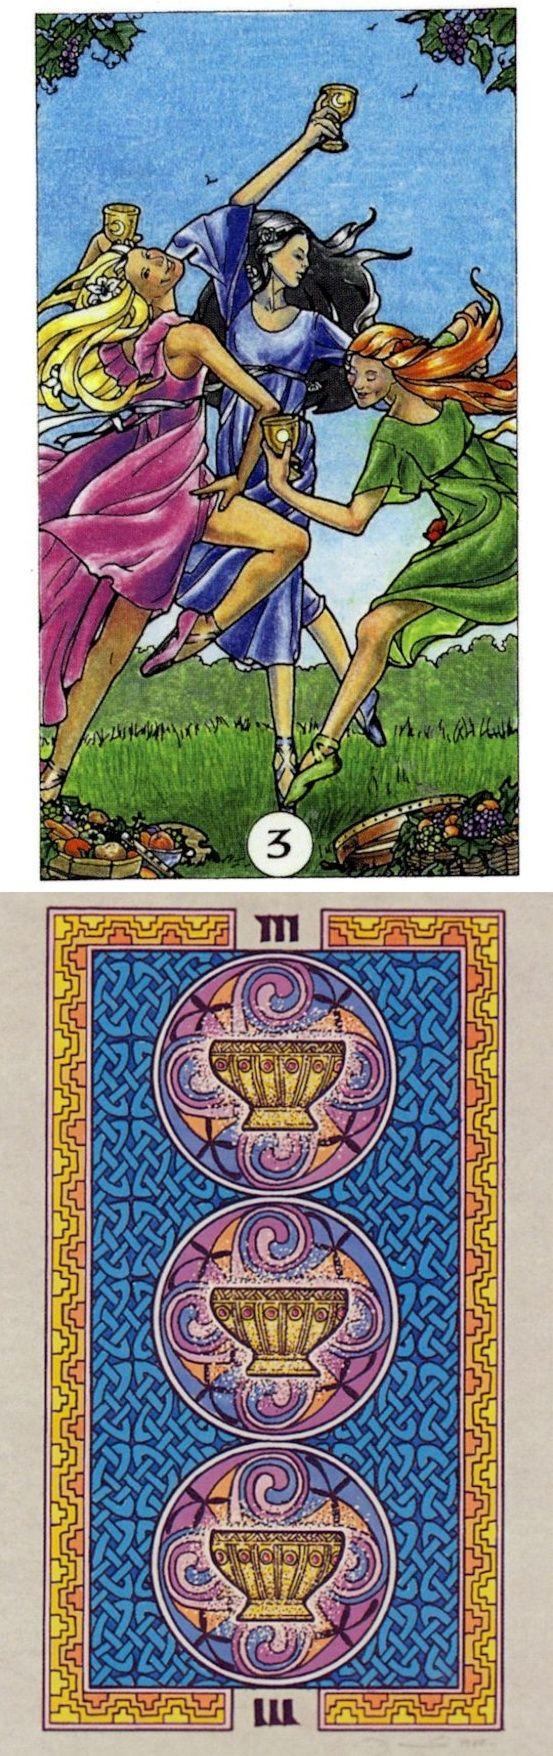 Three of Cups: social pleasure and lack of independence (reverse). Robin Wood Tarot deck and Celtic Tarot deck: lotus tarot reading, tarotspreads vs tarot cards gratis. The best tarot meanings and lenormand cards decks.